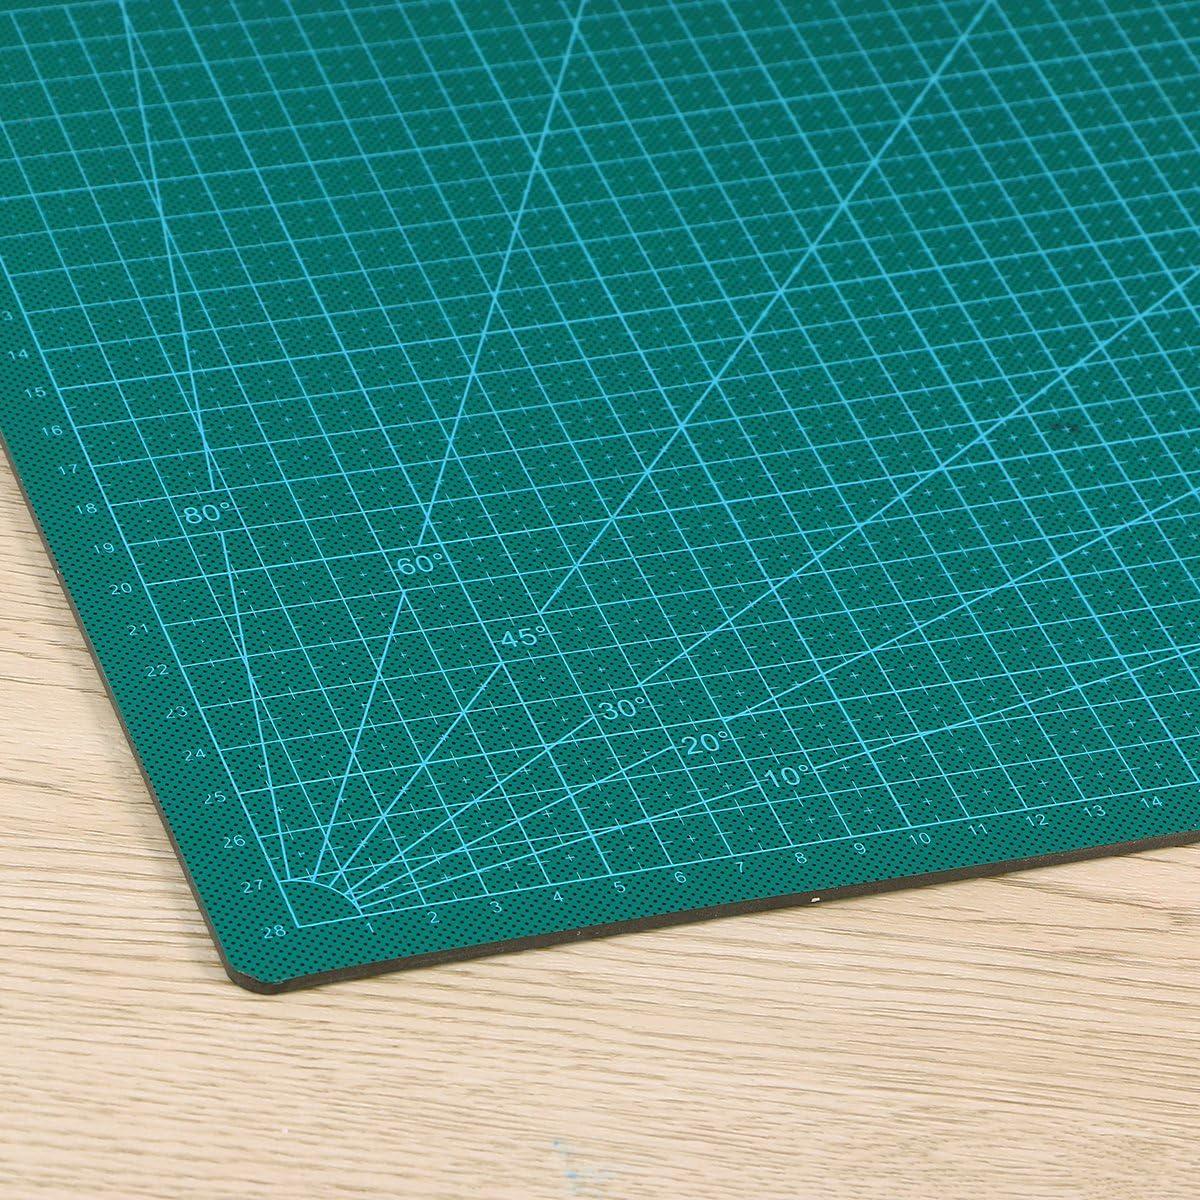 Rosenice Cutting Mat Double-Sided Self-Healing Cutting Mat 45 x 30 cm